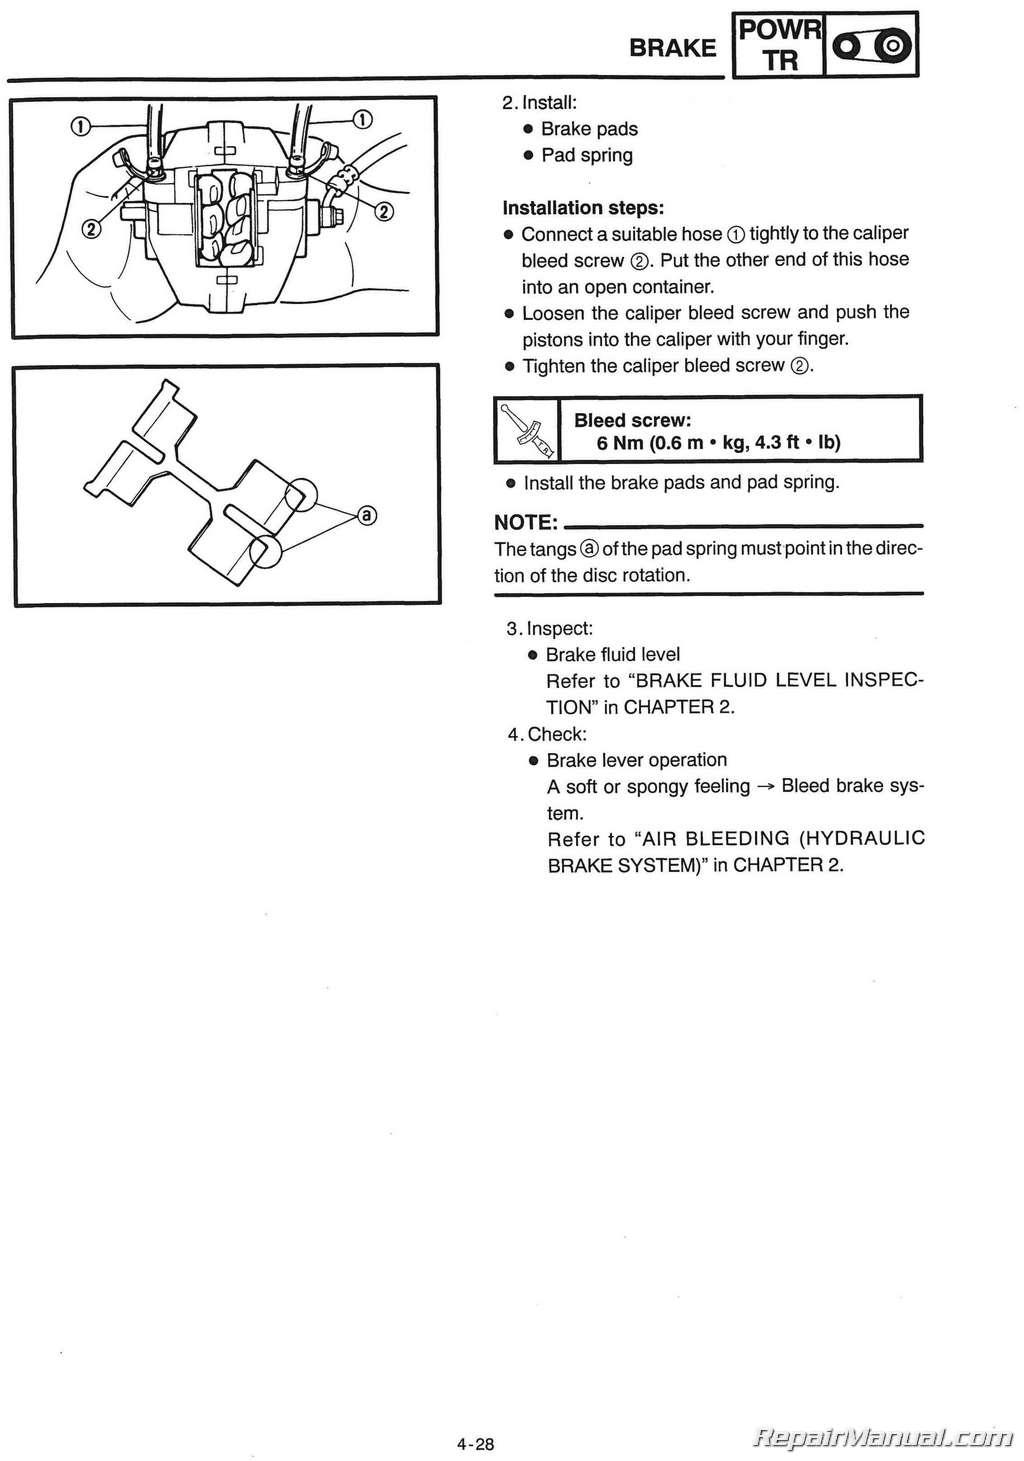 hight resolution of 1999 2001 yamaha snowmobile service manual pz500 phazer vt500xl venture 500 xl